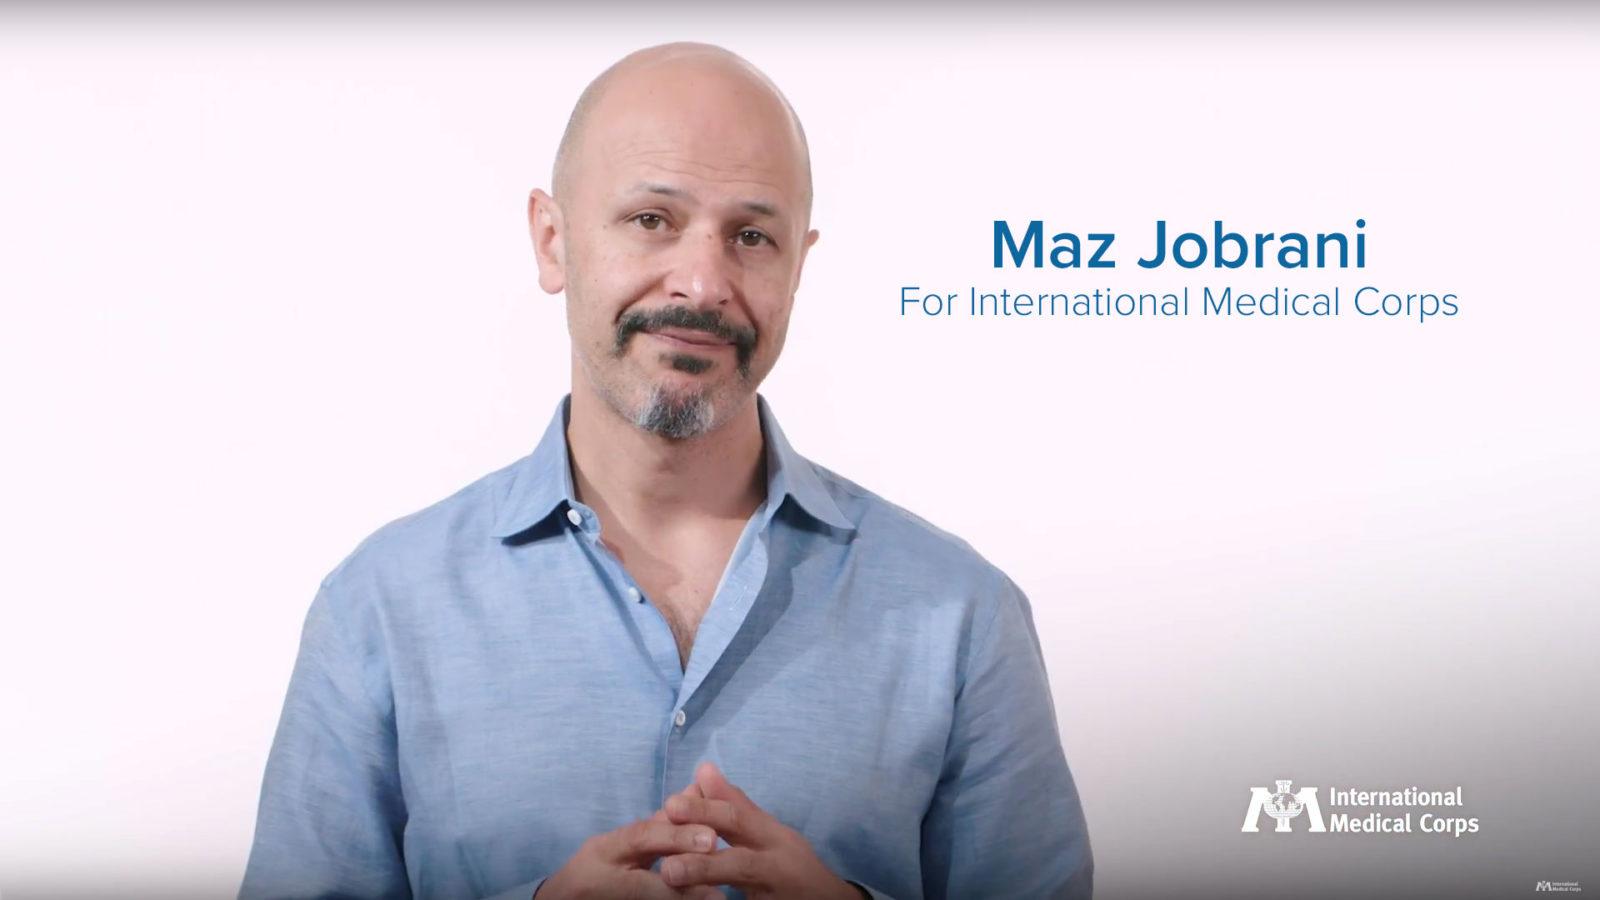 Maz Jobrani for International Medical Corps